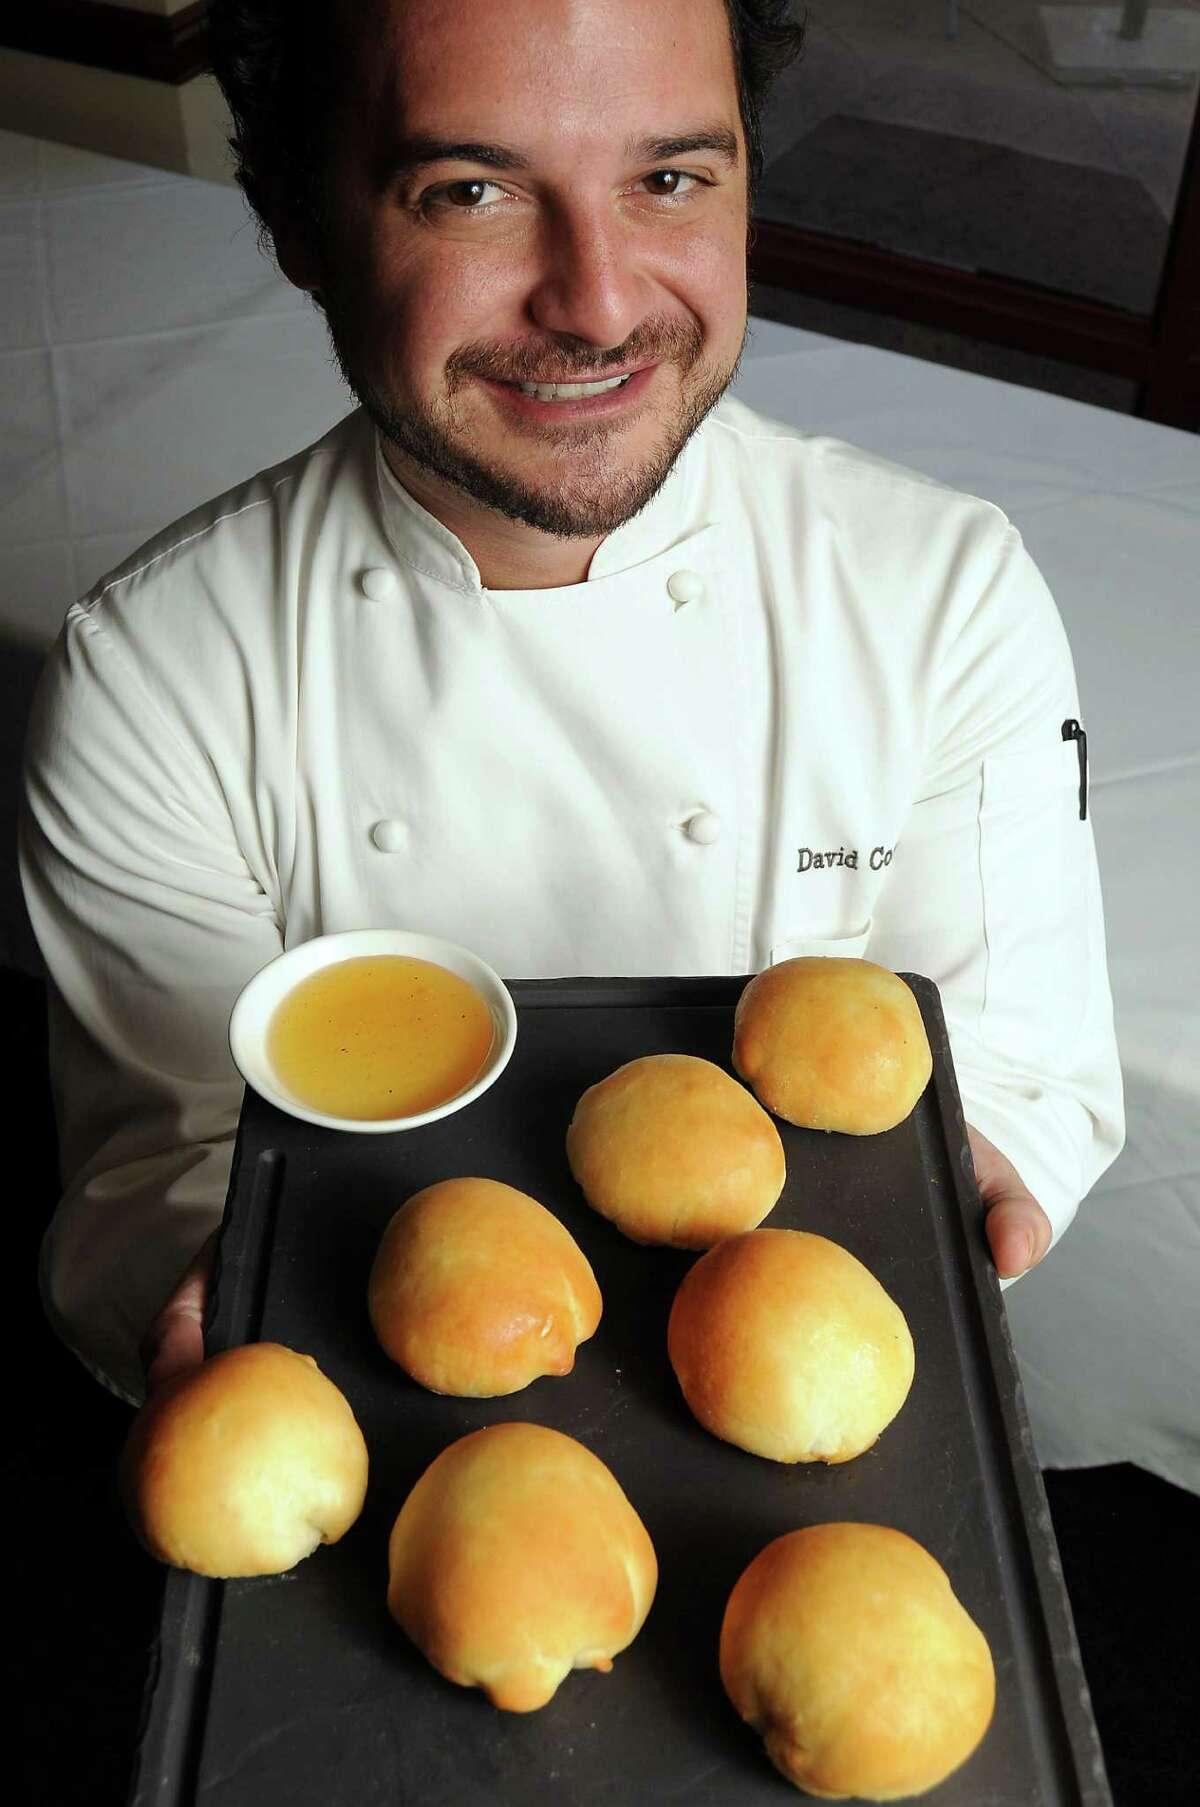 Chef David Cordua's chorizo kolaches at Churasso's on Westheimer Thursday Sept. 12, 2013.(Dave Rossman photo)